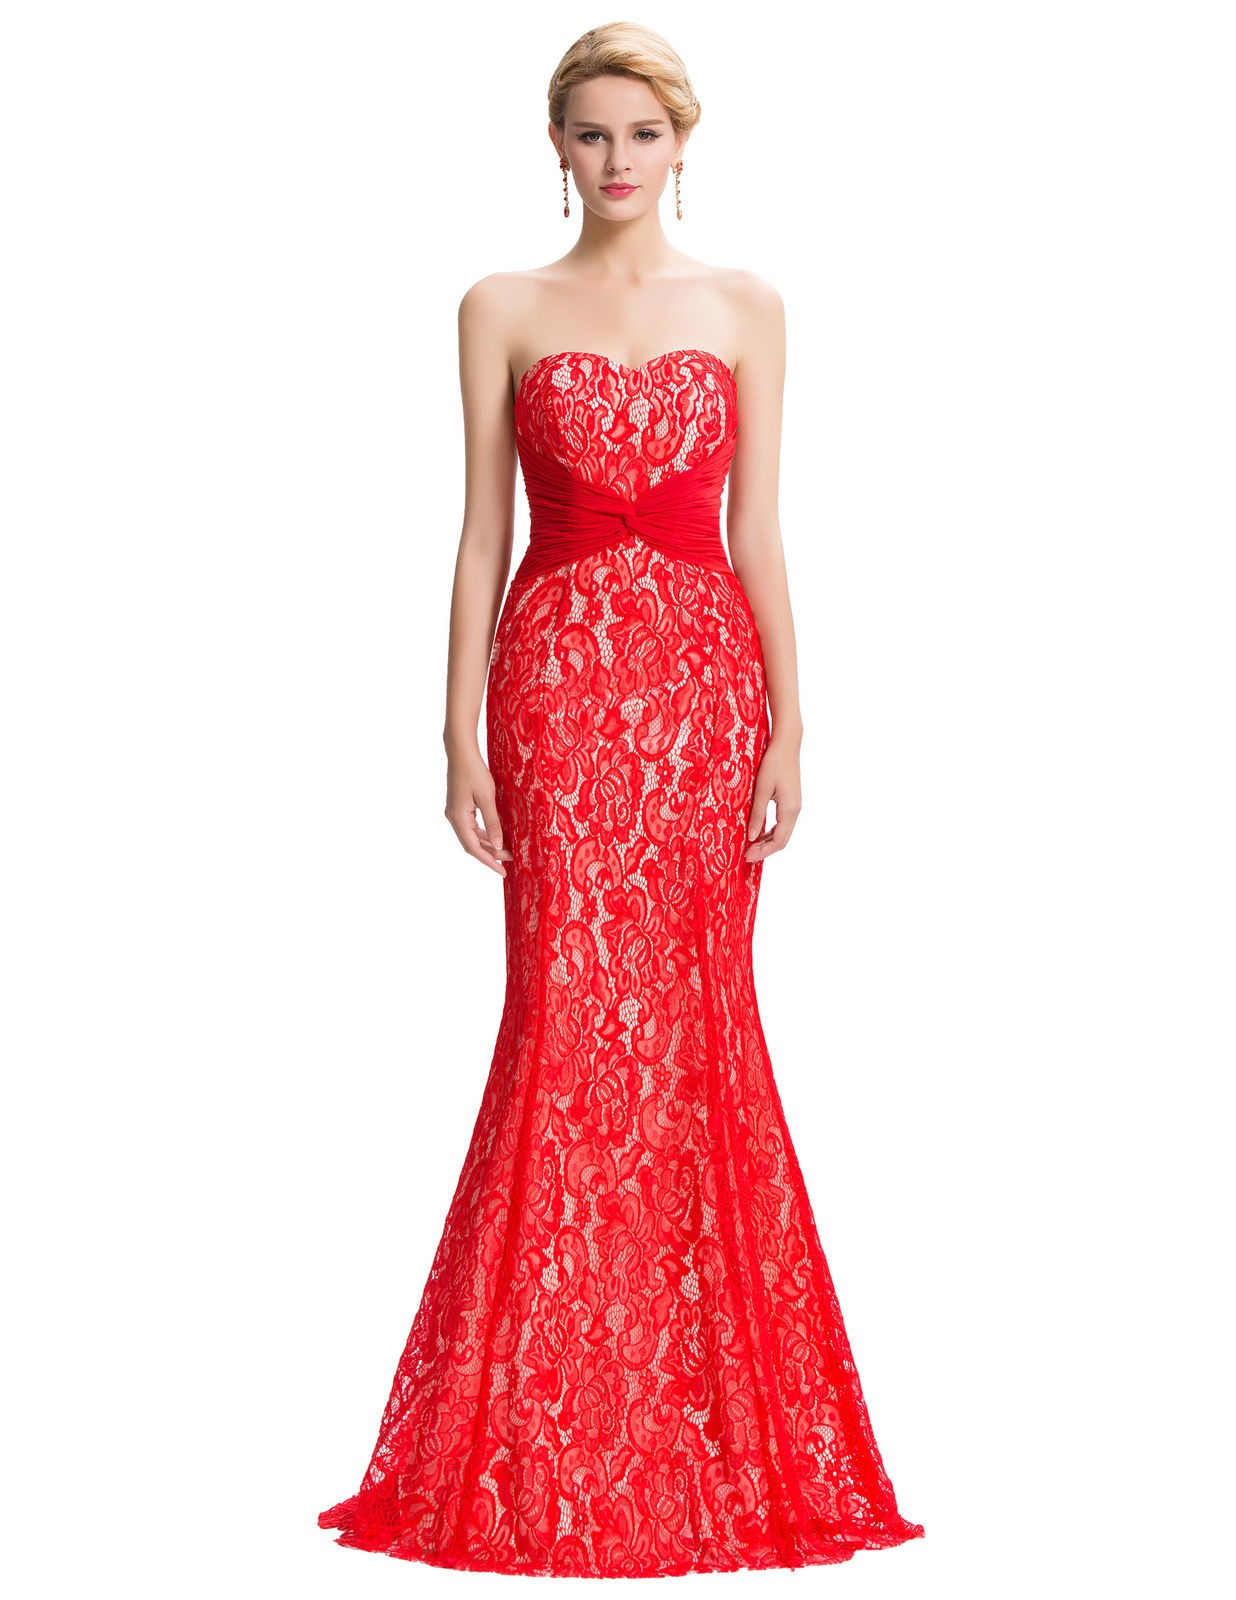 Sexy červené plesové šaty krajkové upnuté na tělo 6ec1e4b4f6